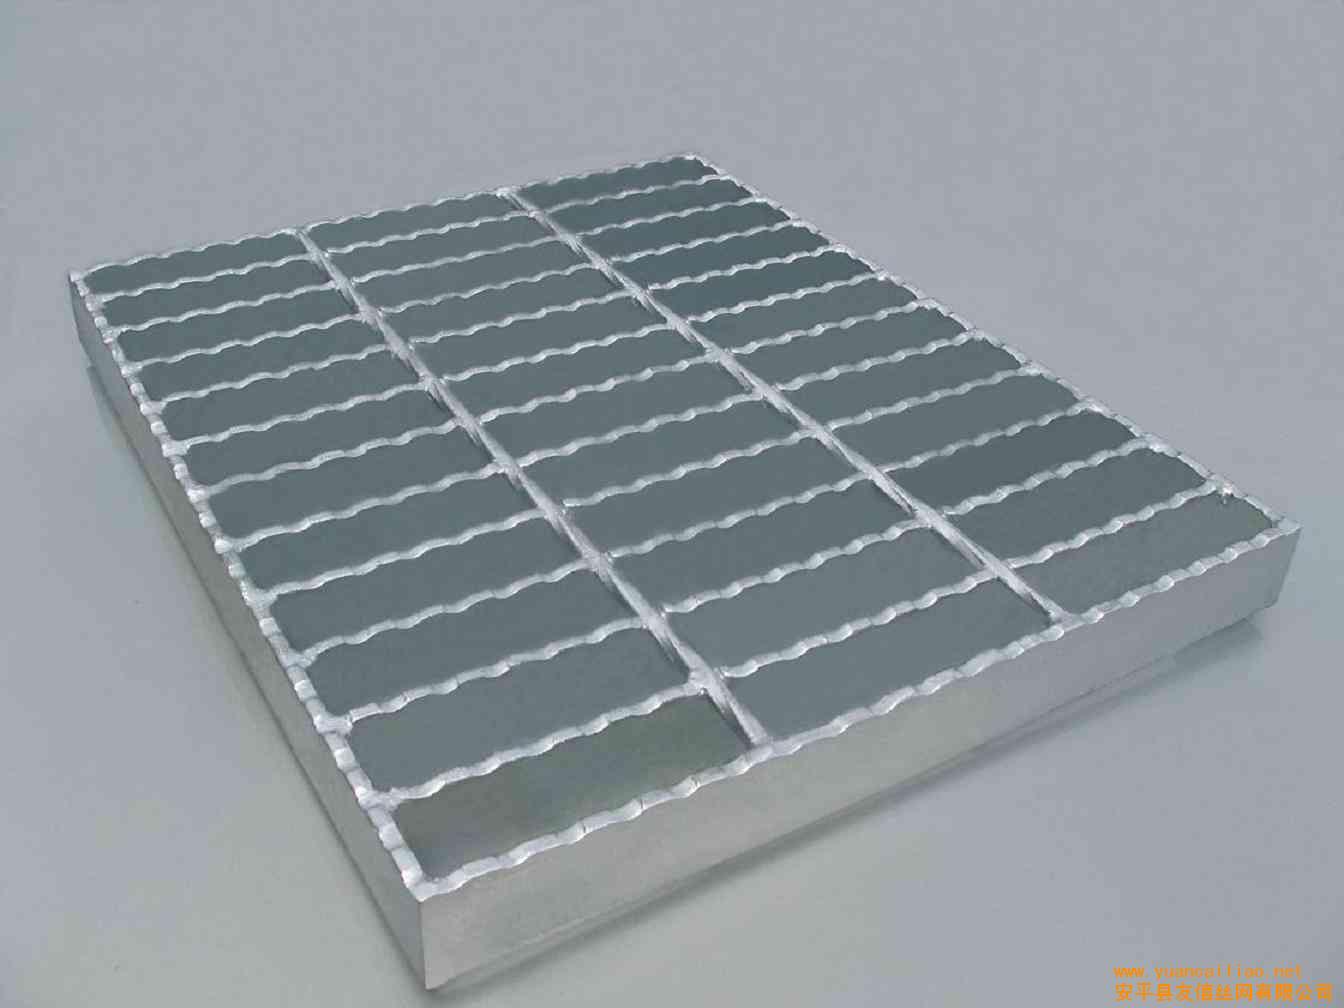 anti skid mats metal floor walkway grating purchasing. Black Bedroom Furniture Sets. Home Design Ideas